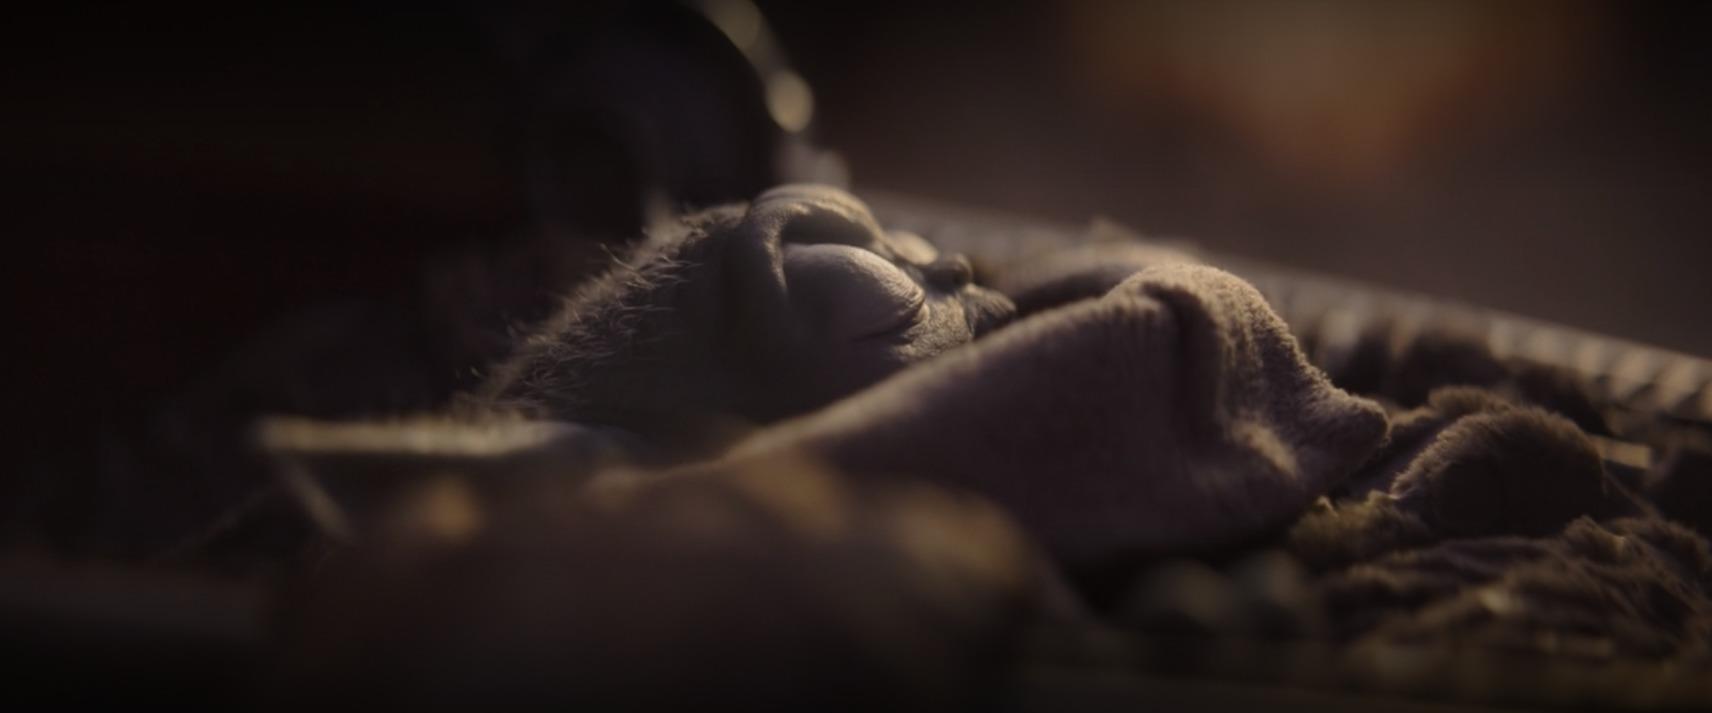 Baby Yoda asleep in his space crib while The Mandalorian softly rocks it